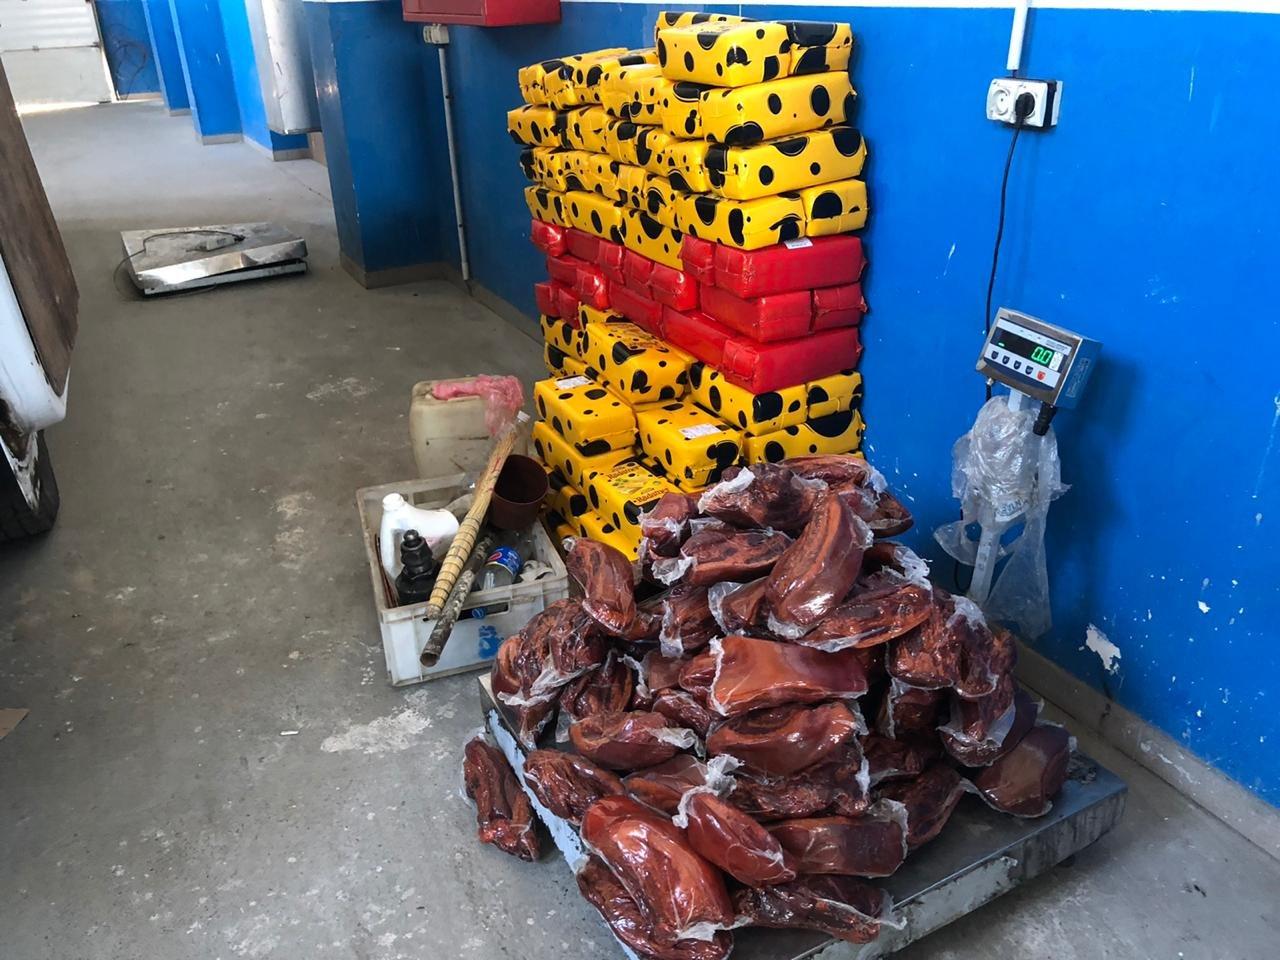 Українець намагався привезти з Польщі майже 1,5 тонни м'яса, сала та сиру (фото), фото-1